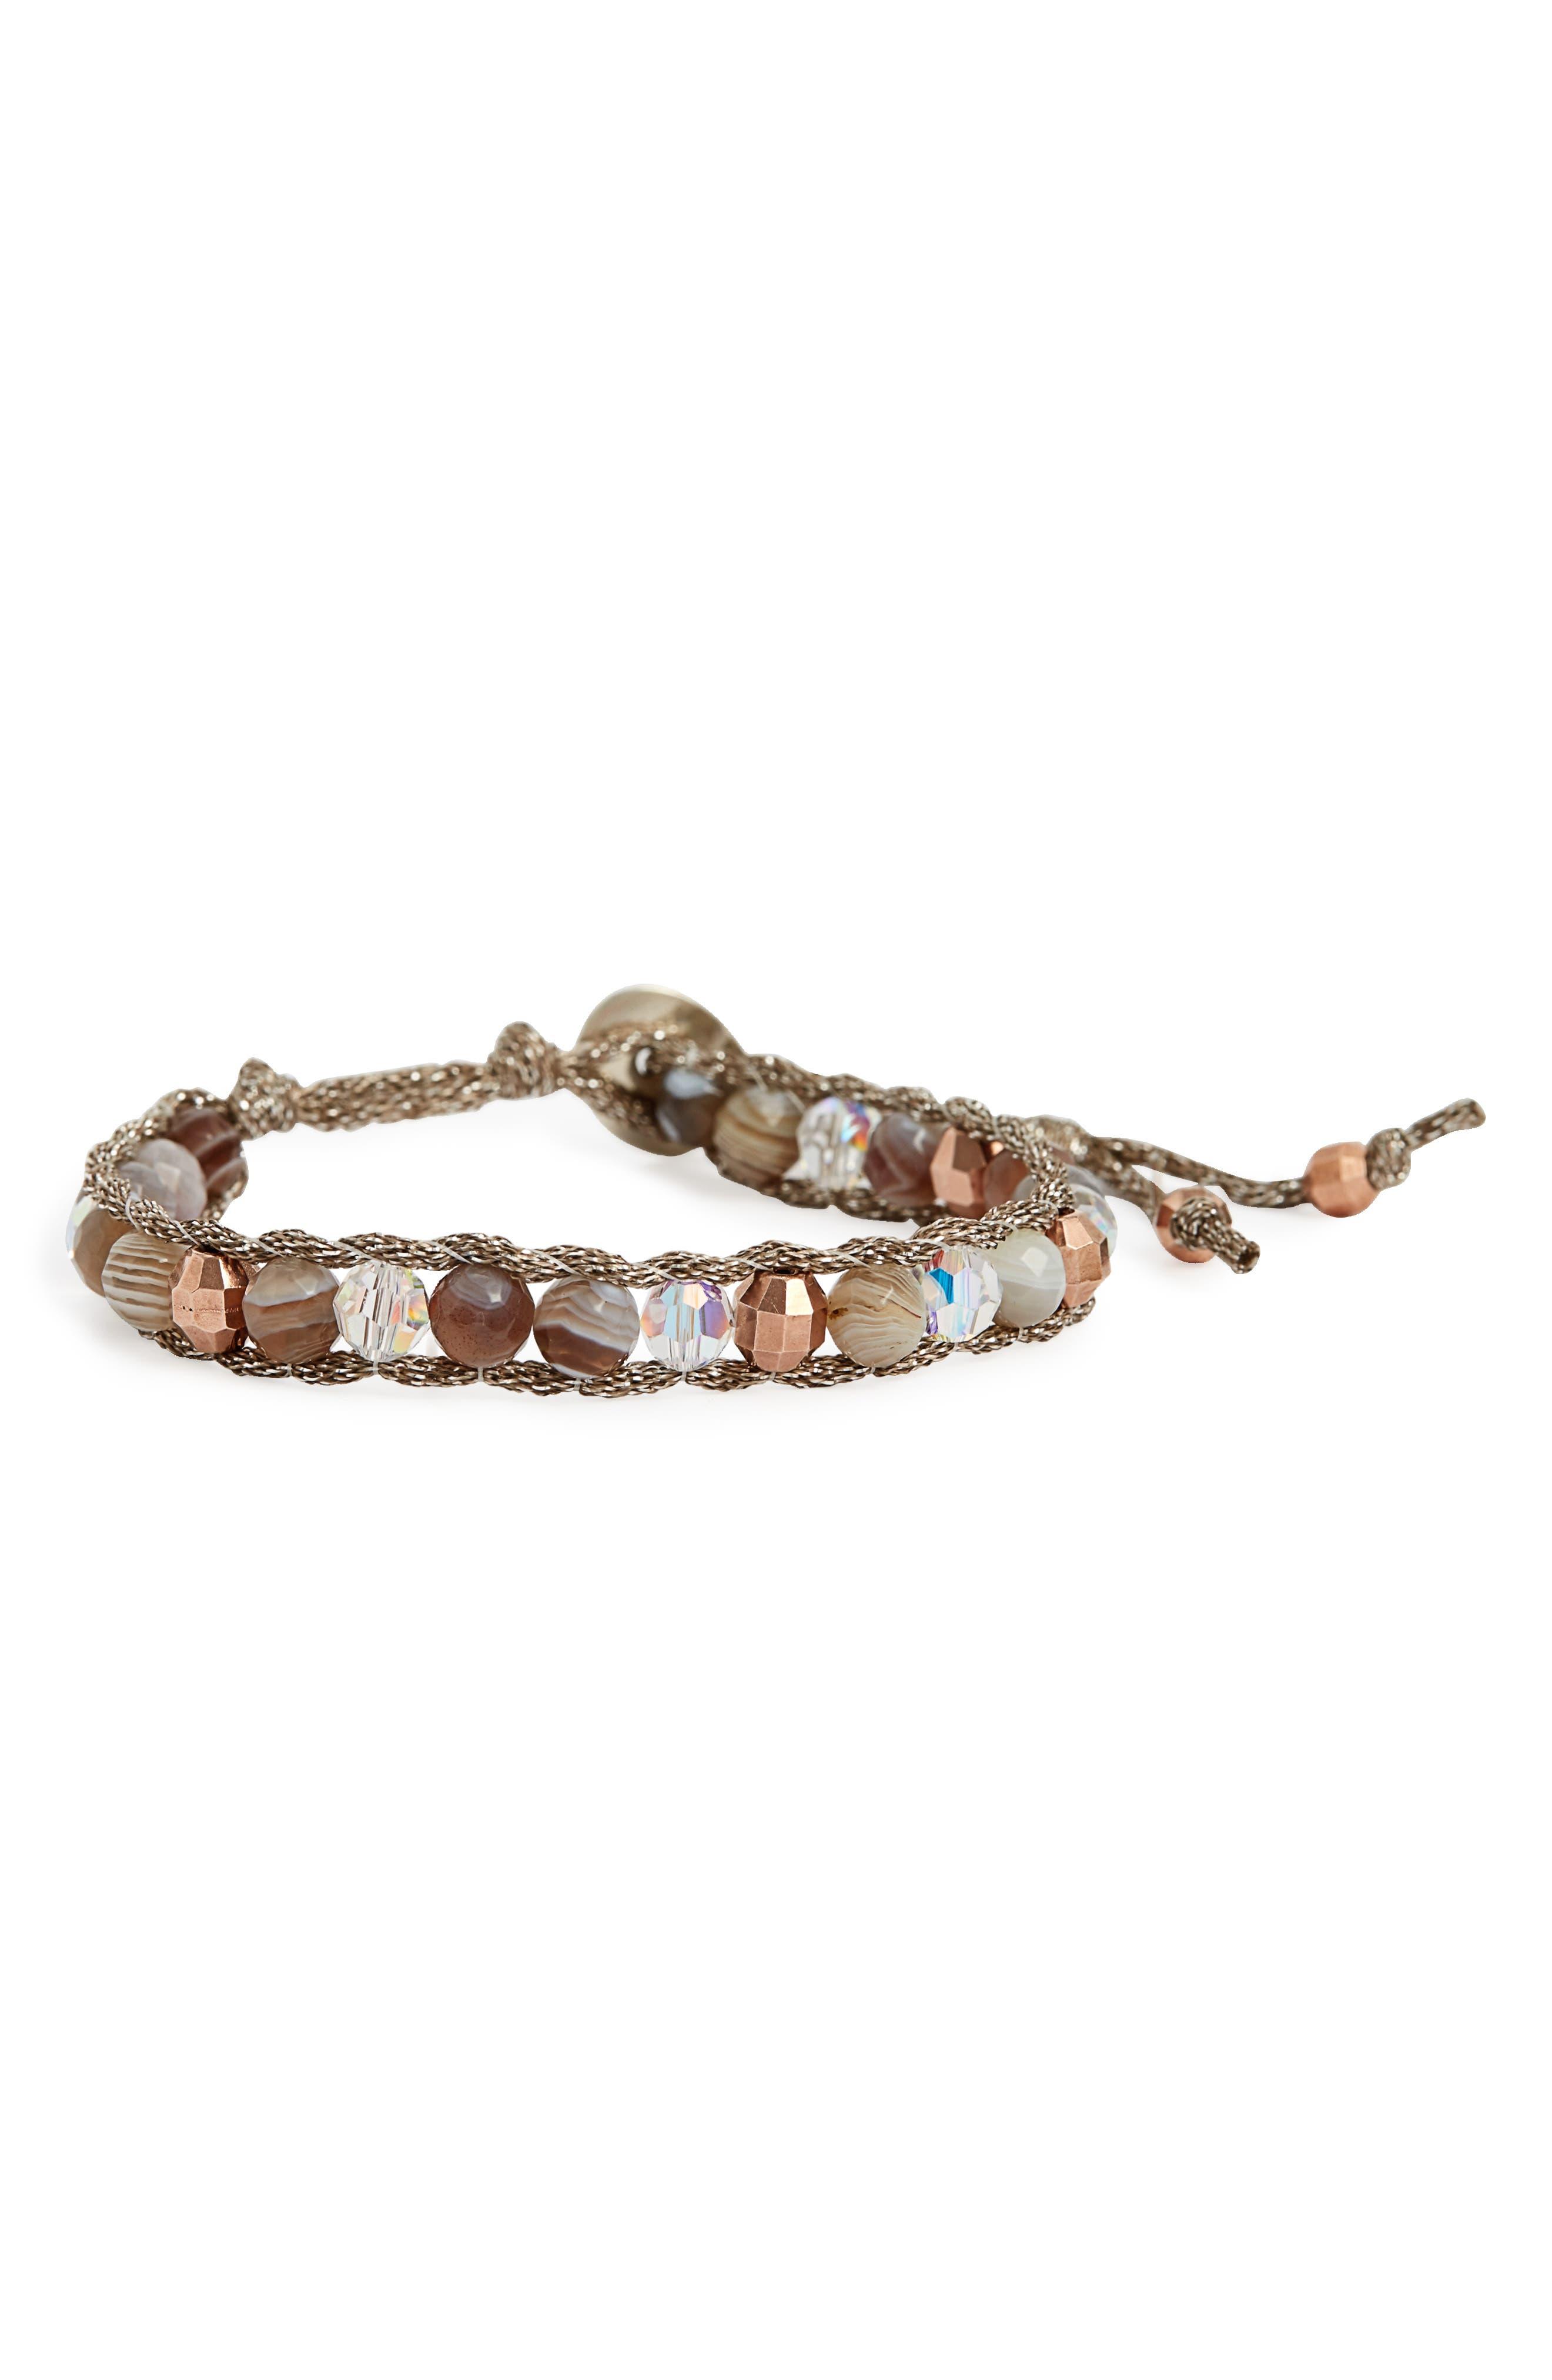 Agate & Crystal Bracelet,                             Main thumbnail 1, color,                             Botswana Agate